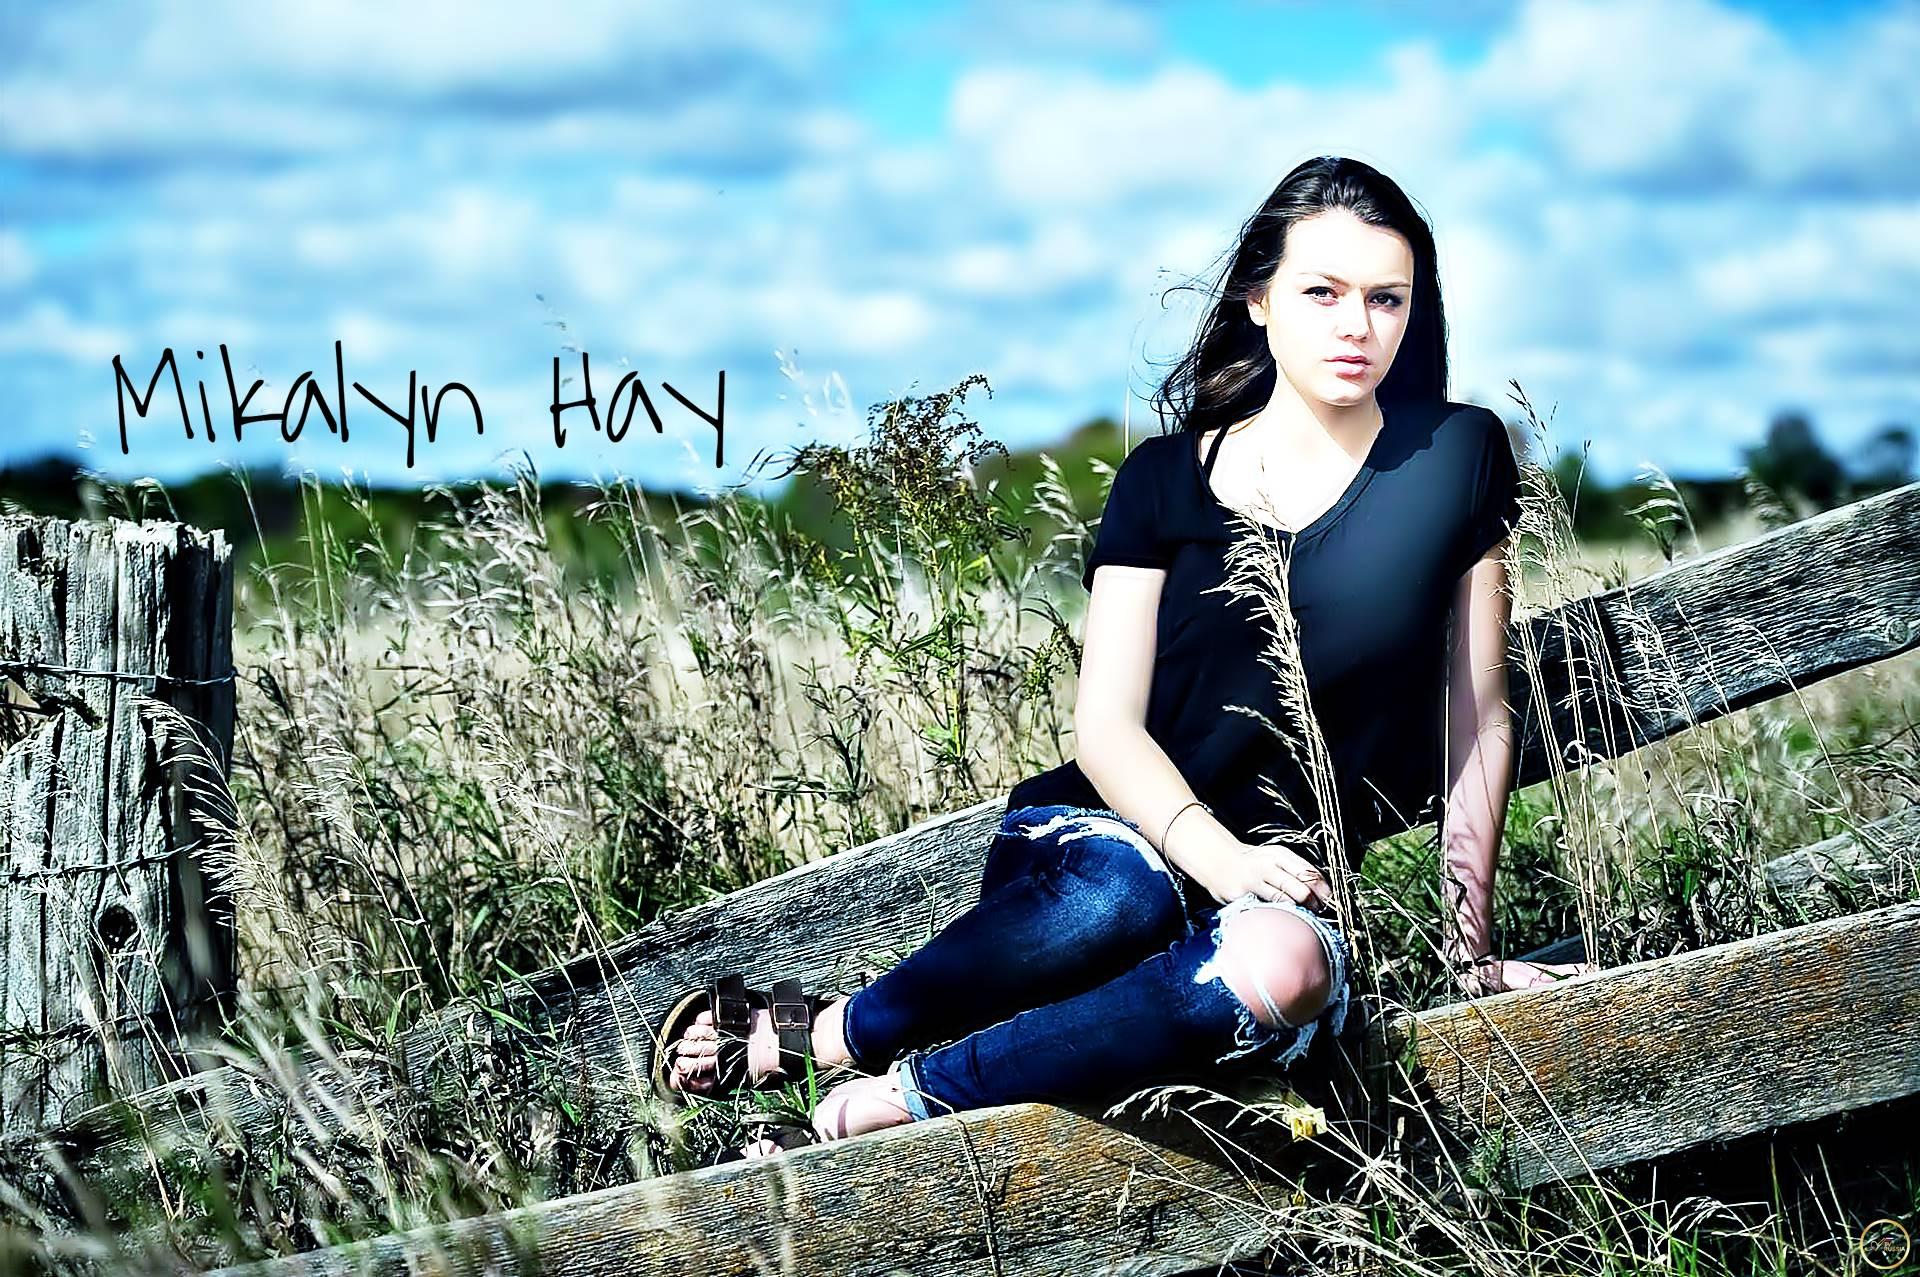 Mikalyn Hay